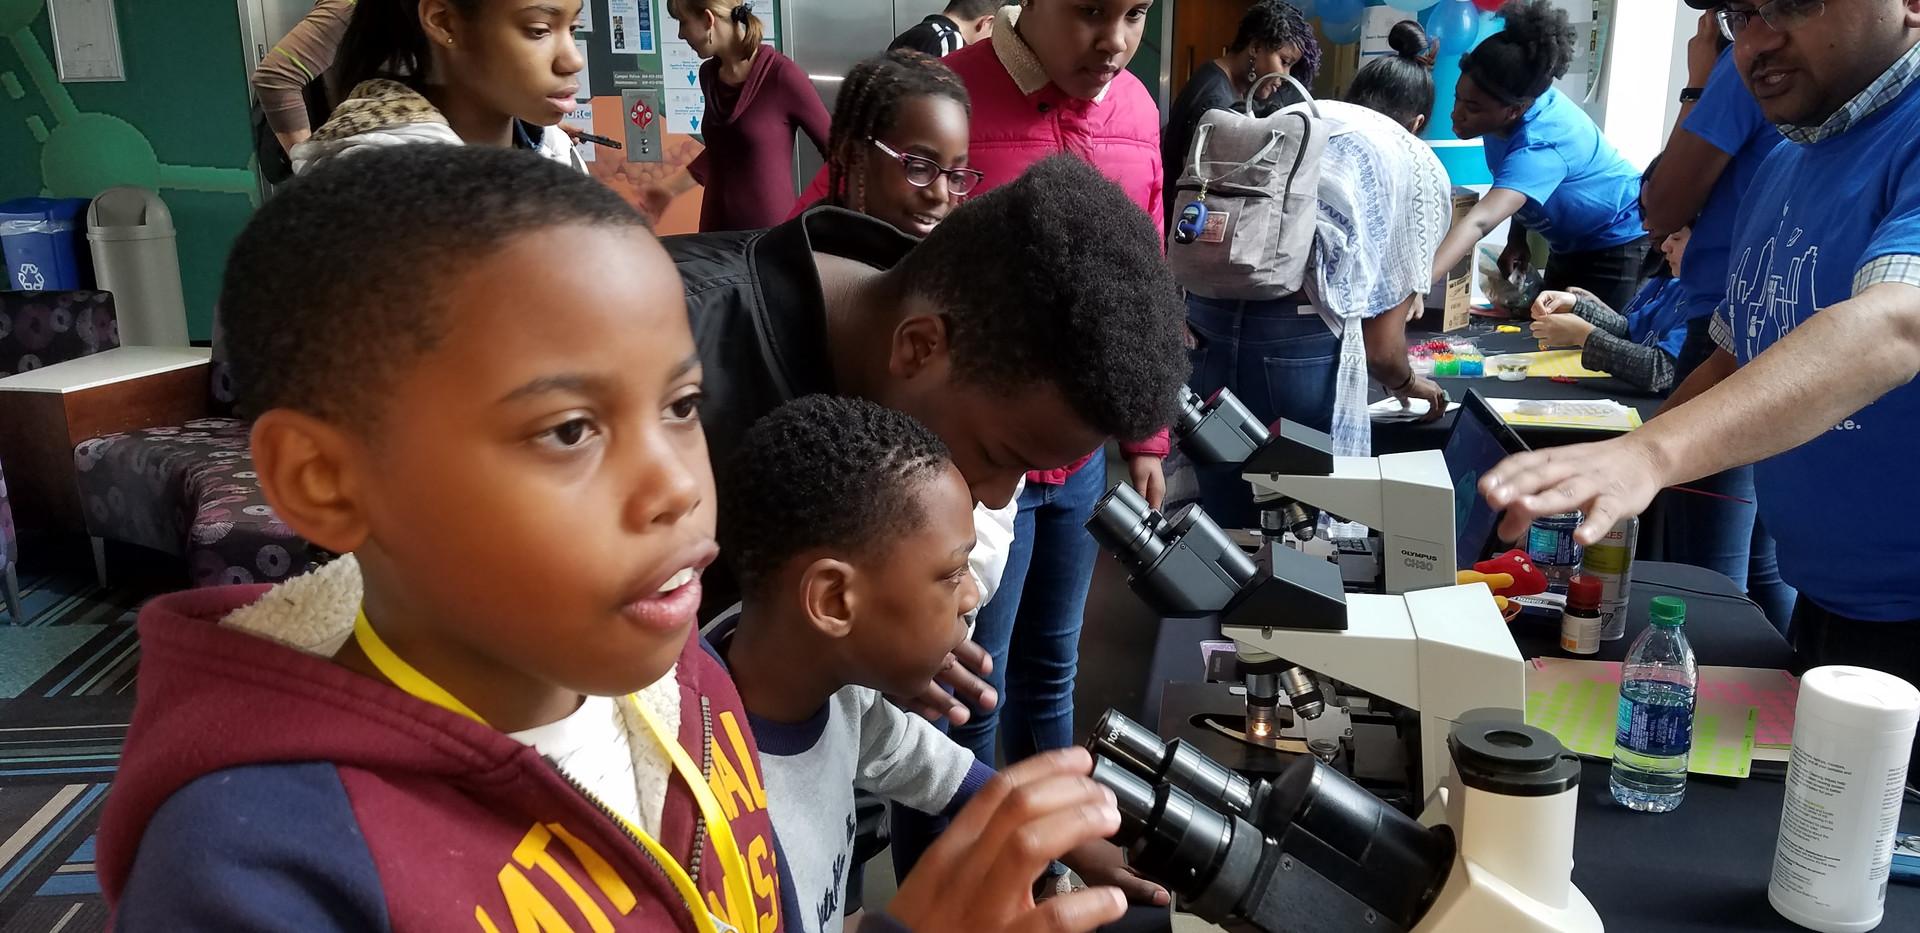 EAKC at the Atlanta Science Festival